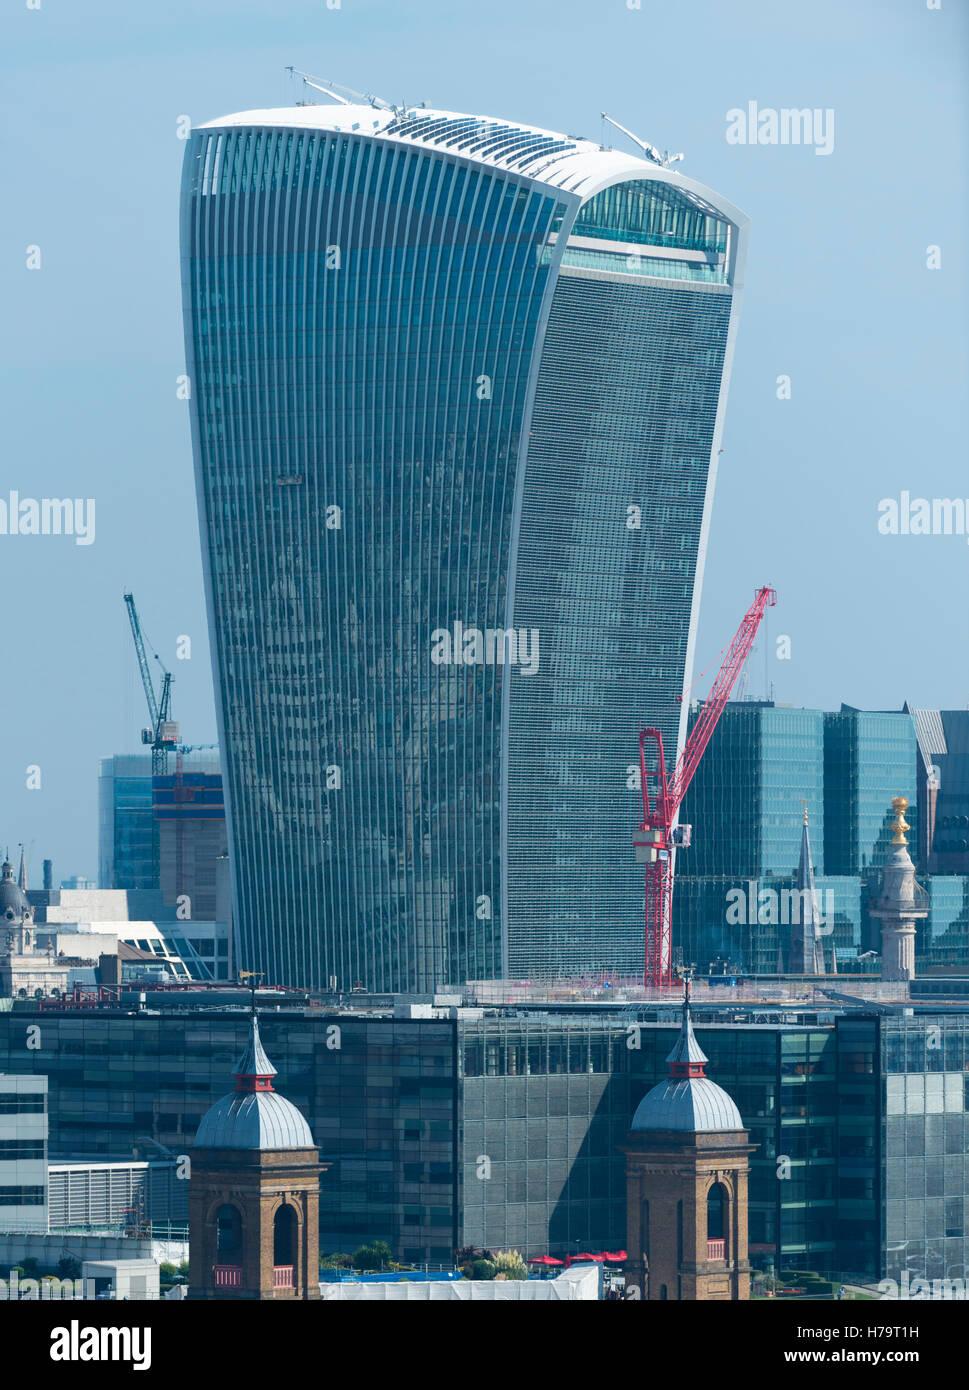 London City Southbank 20 Fenchurch Street aka das WalkieTalkie Hochhaus 160 m 525 ft hoch Stockbild